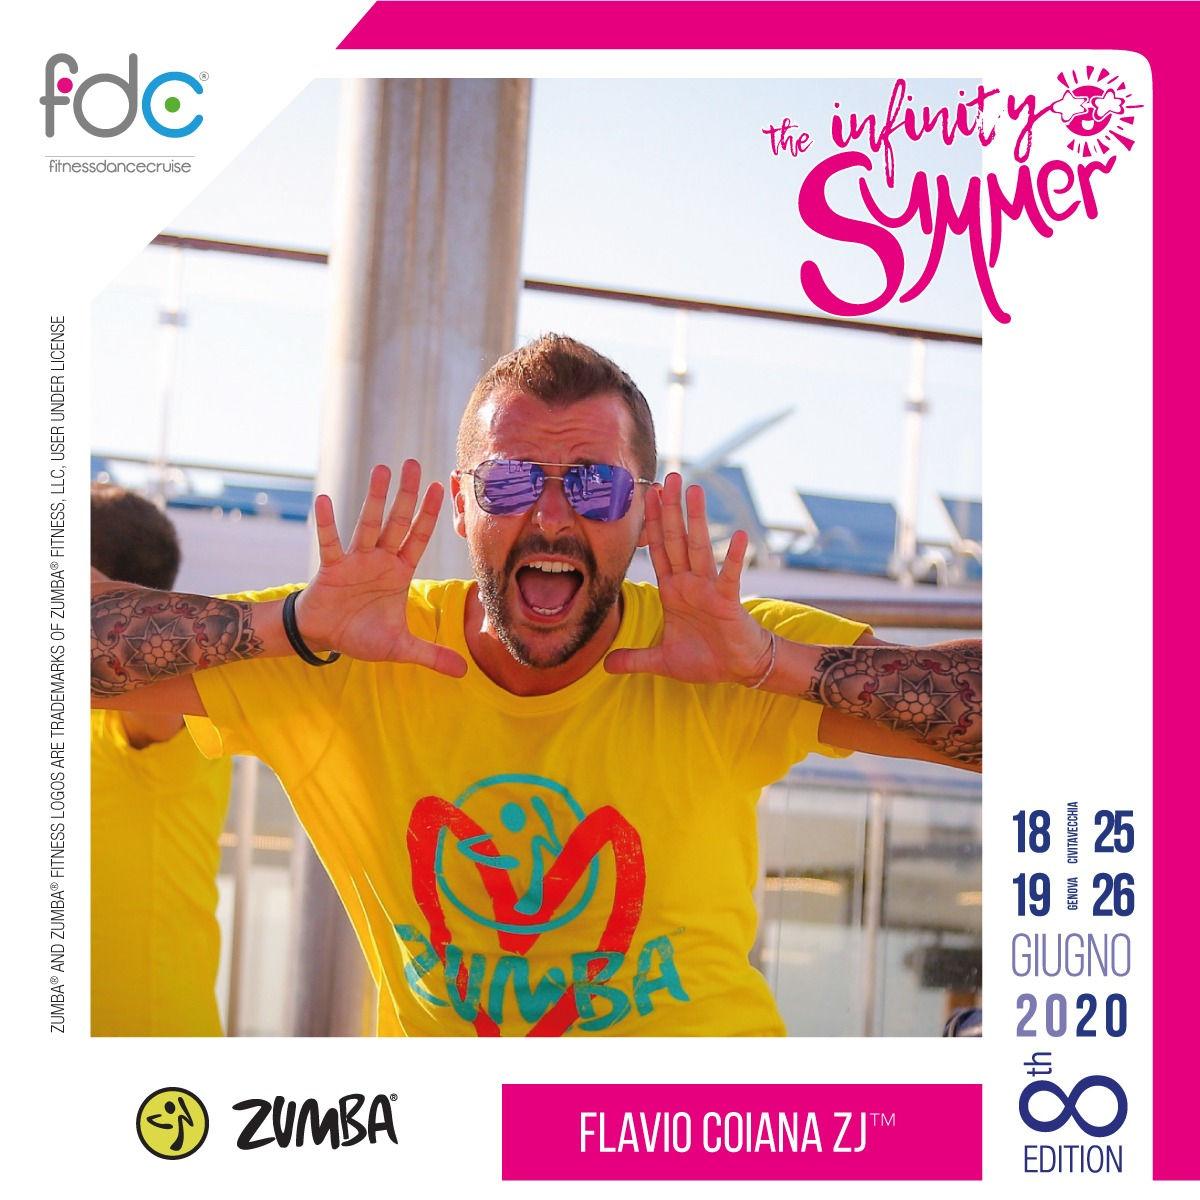 Zumba FDC Presenter Flavio Coiana ZJ